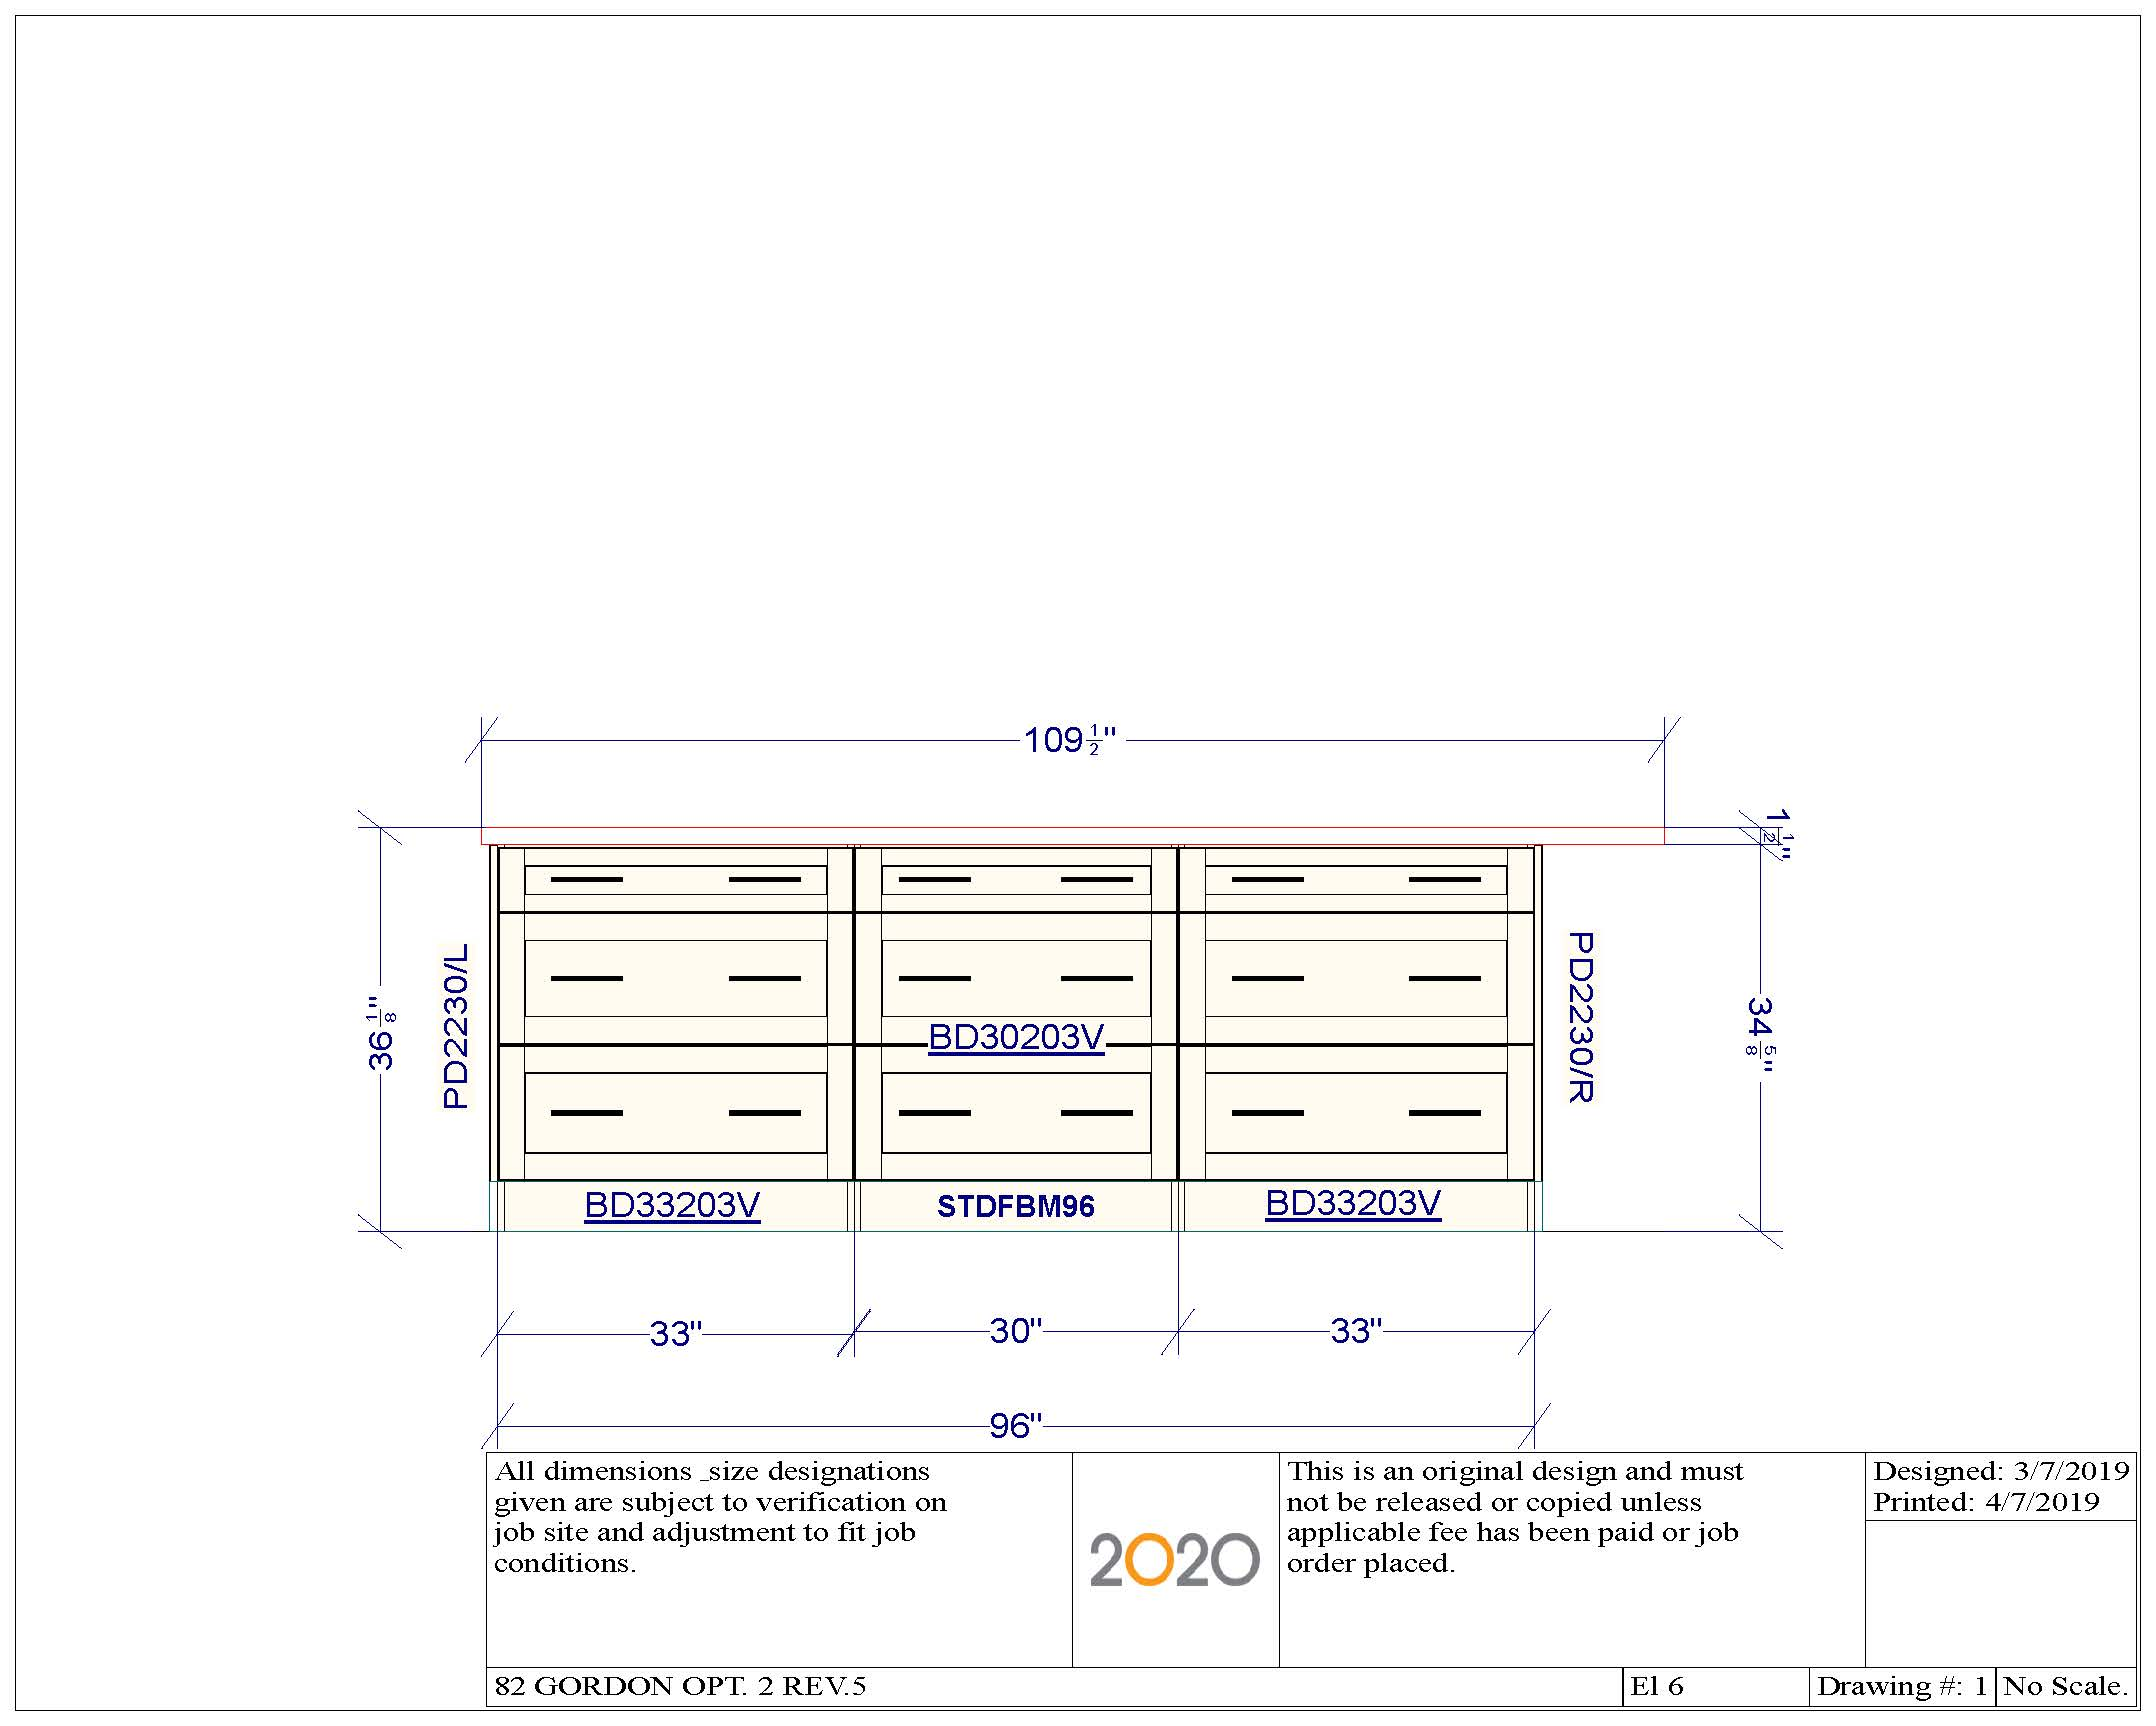 82 GORDON OPT. 2 REV.5-11_Page_15